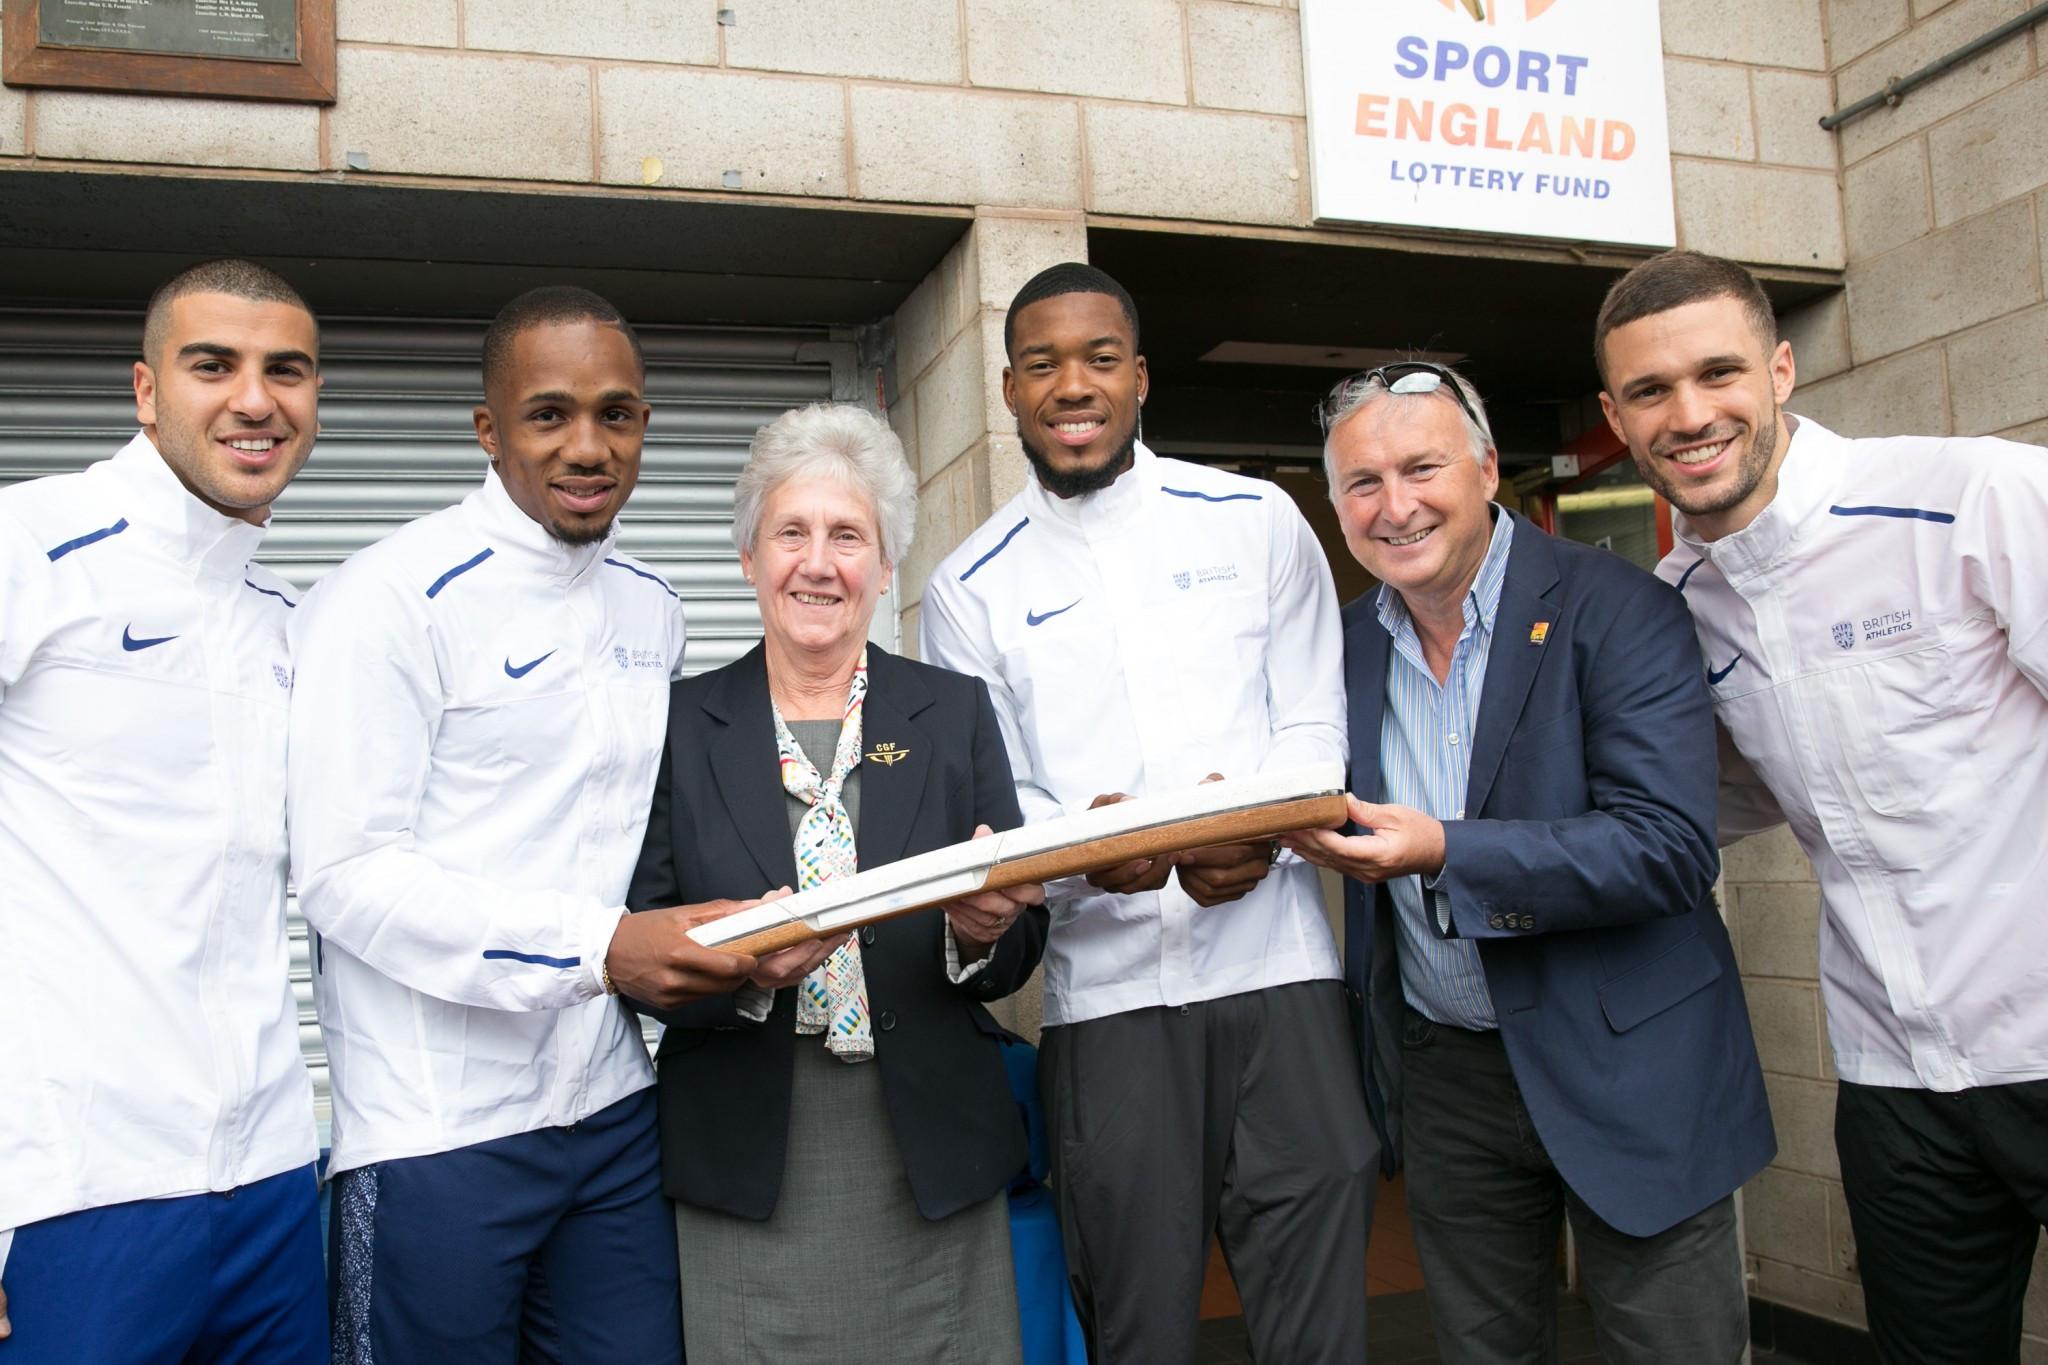 Queen's Baton Relay passes through 2022 Commonwealth Games bidding city Birmingham